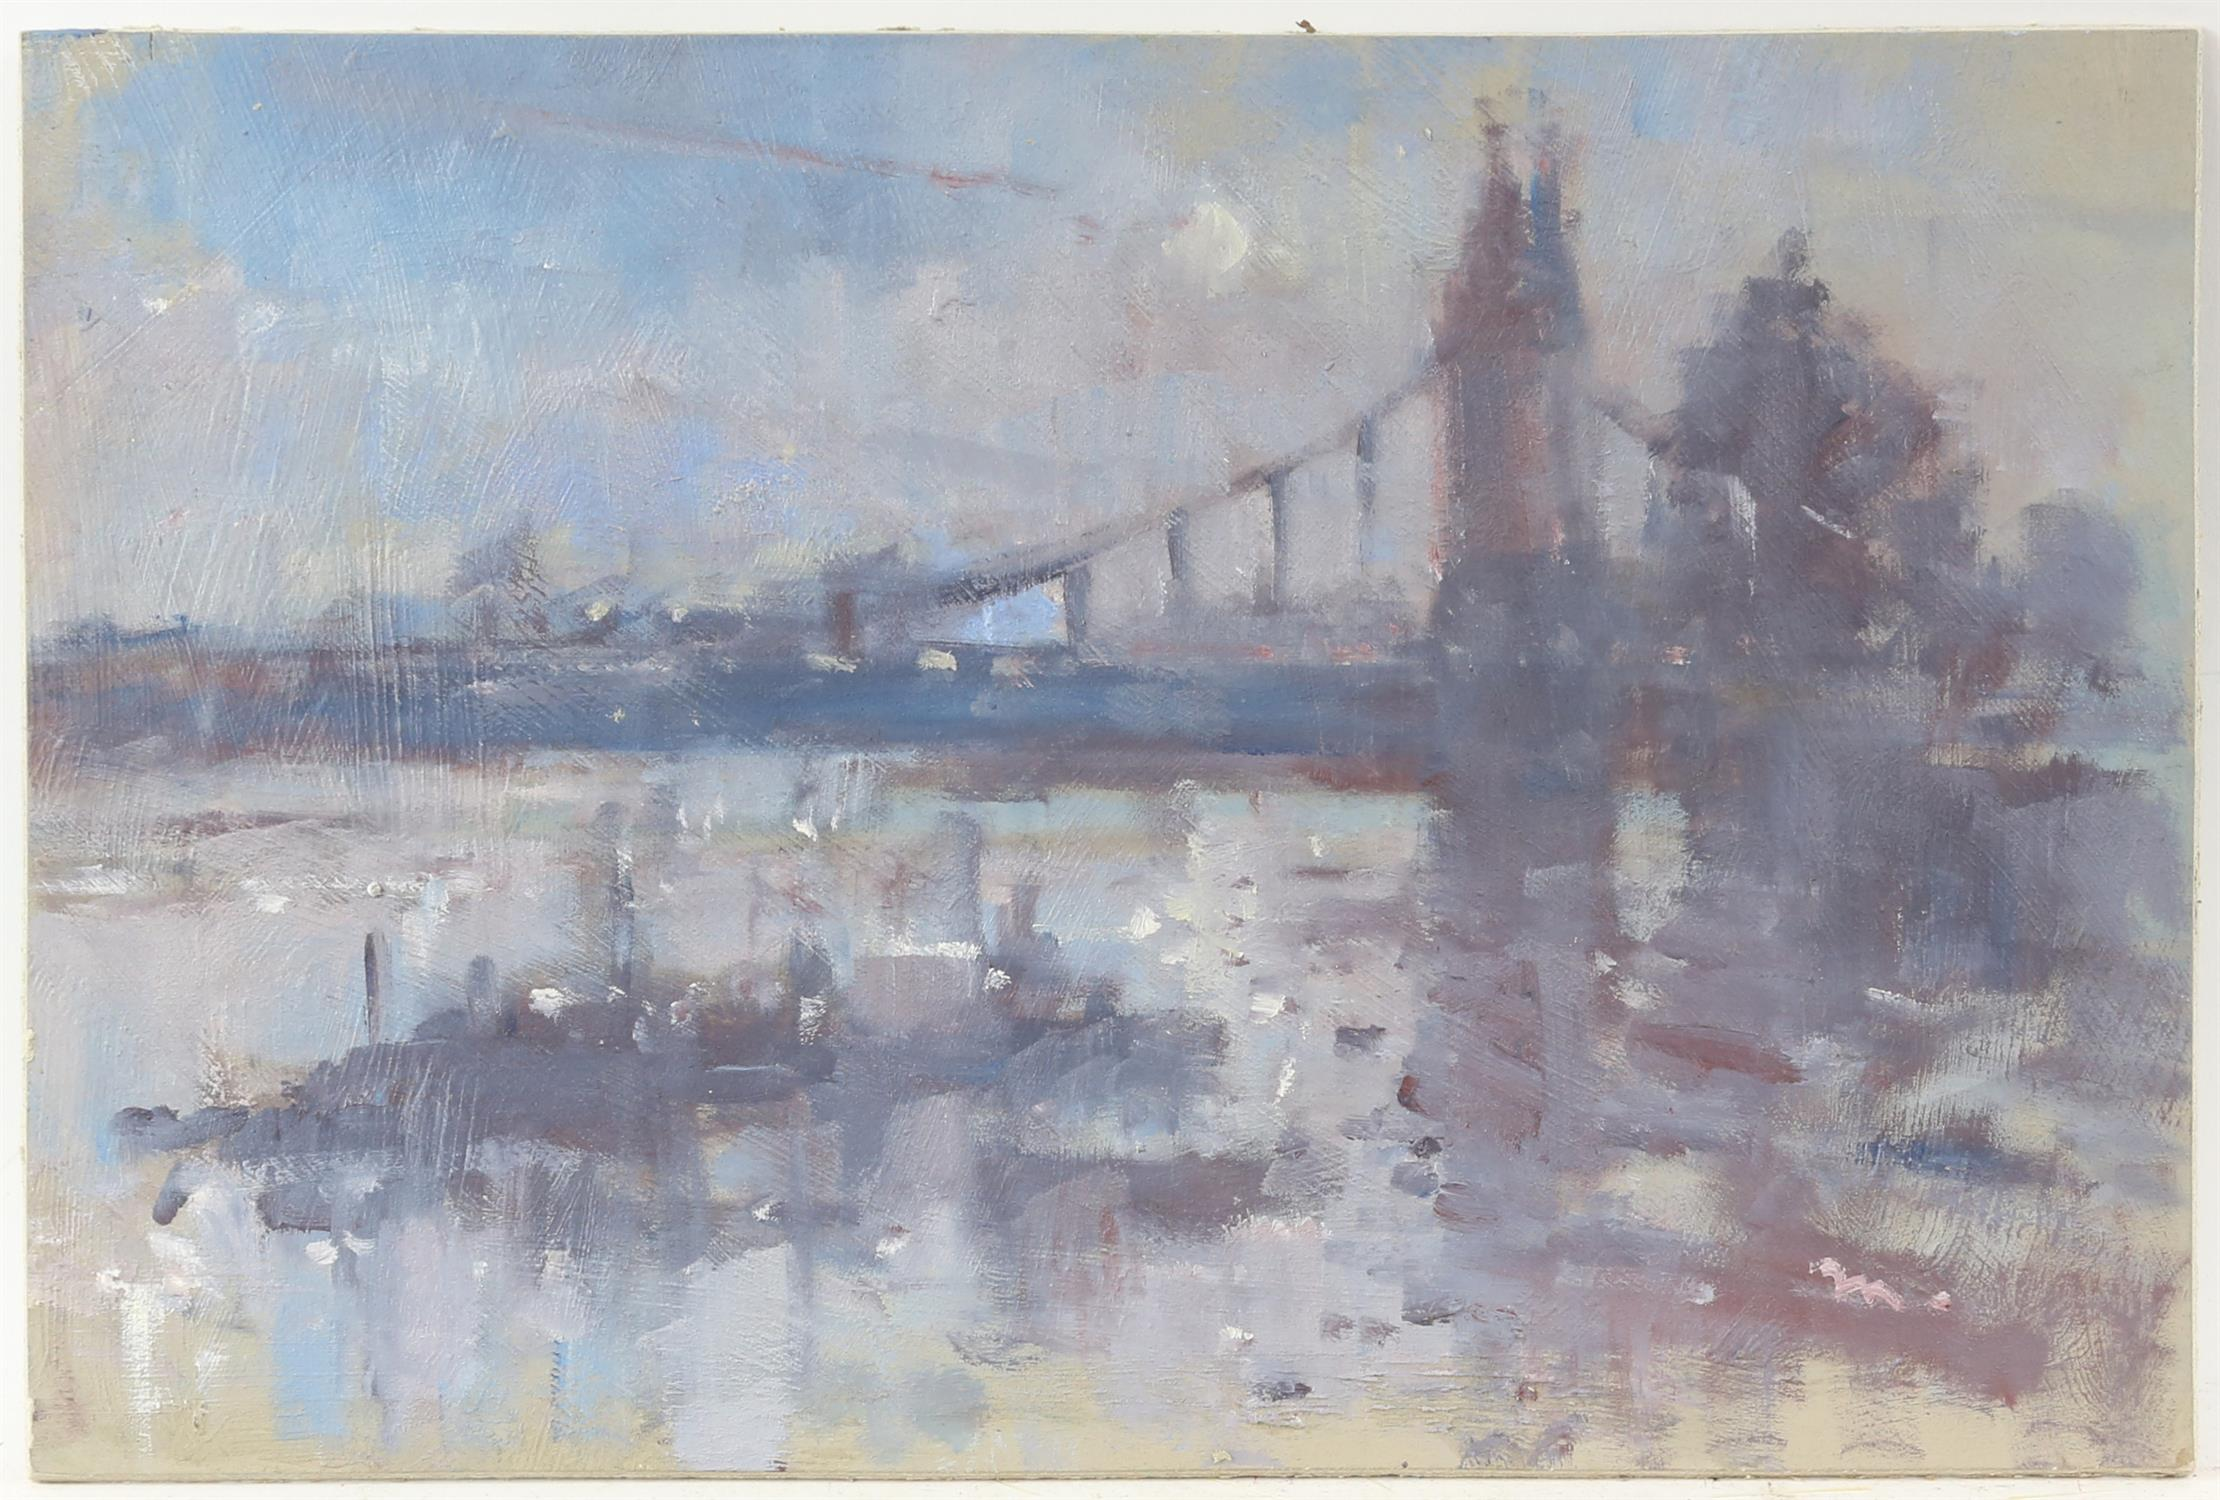 Tony Merrick (British 20th century), 'Twilight, Hammersmith Bridge 2010', inscribed verso,